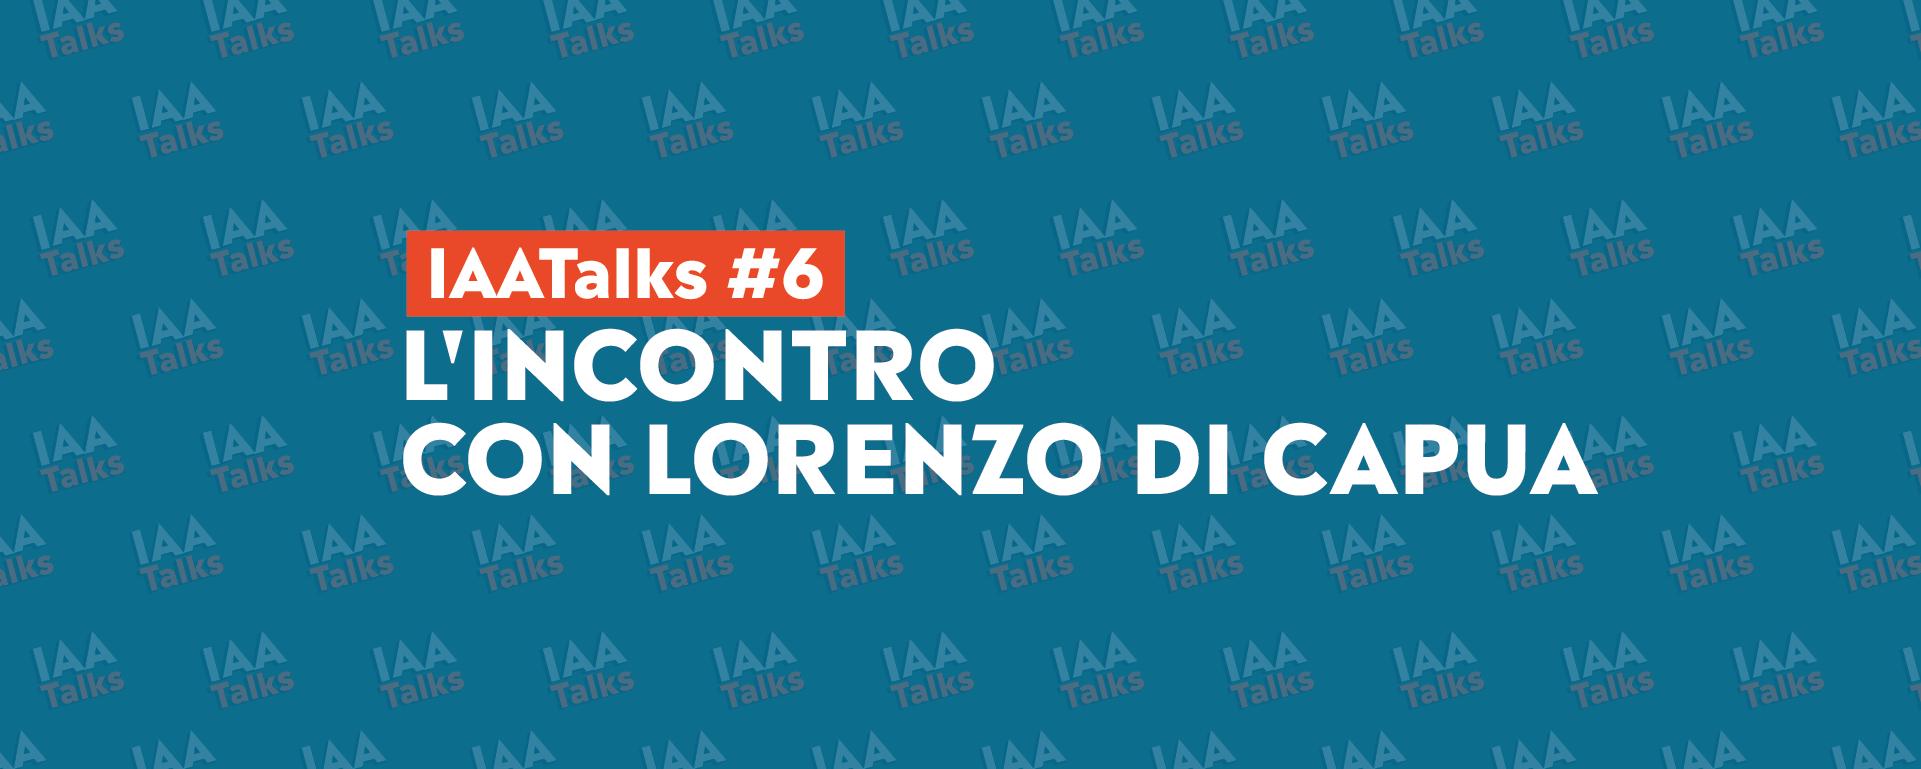 IAA_Noku_Talks_agenzia_creativa_milano